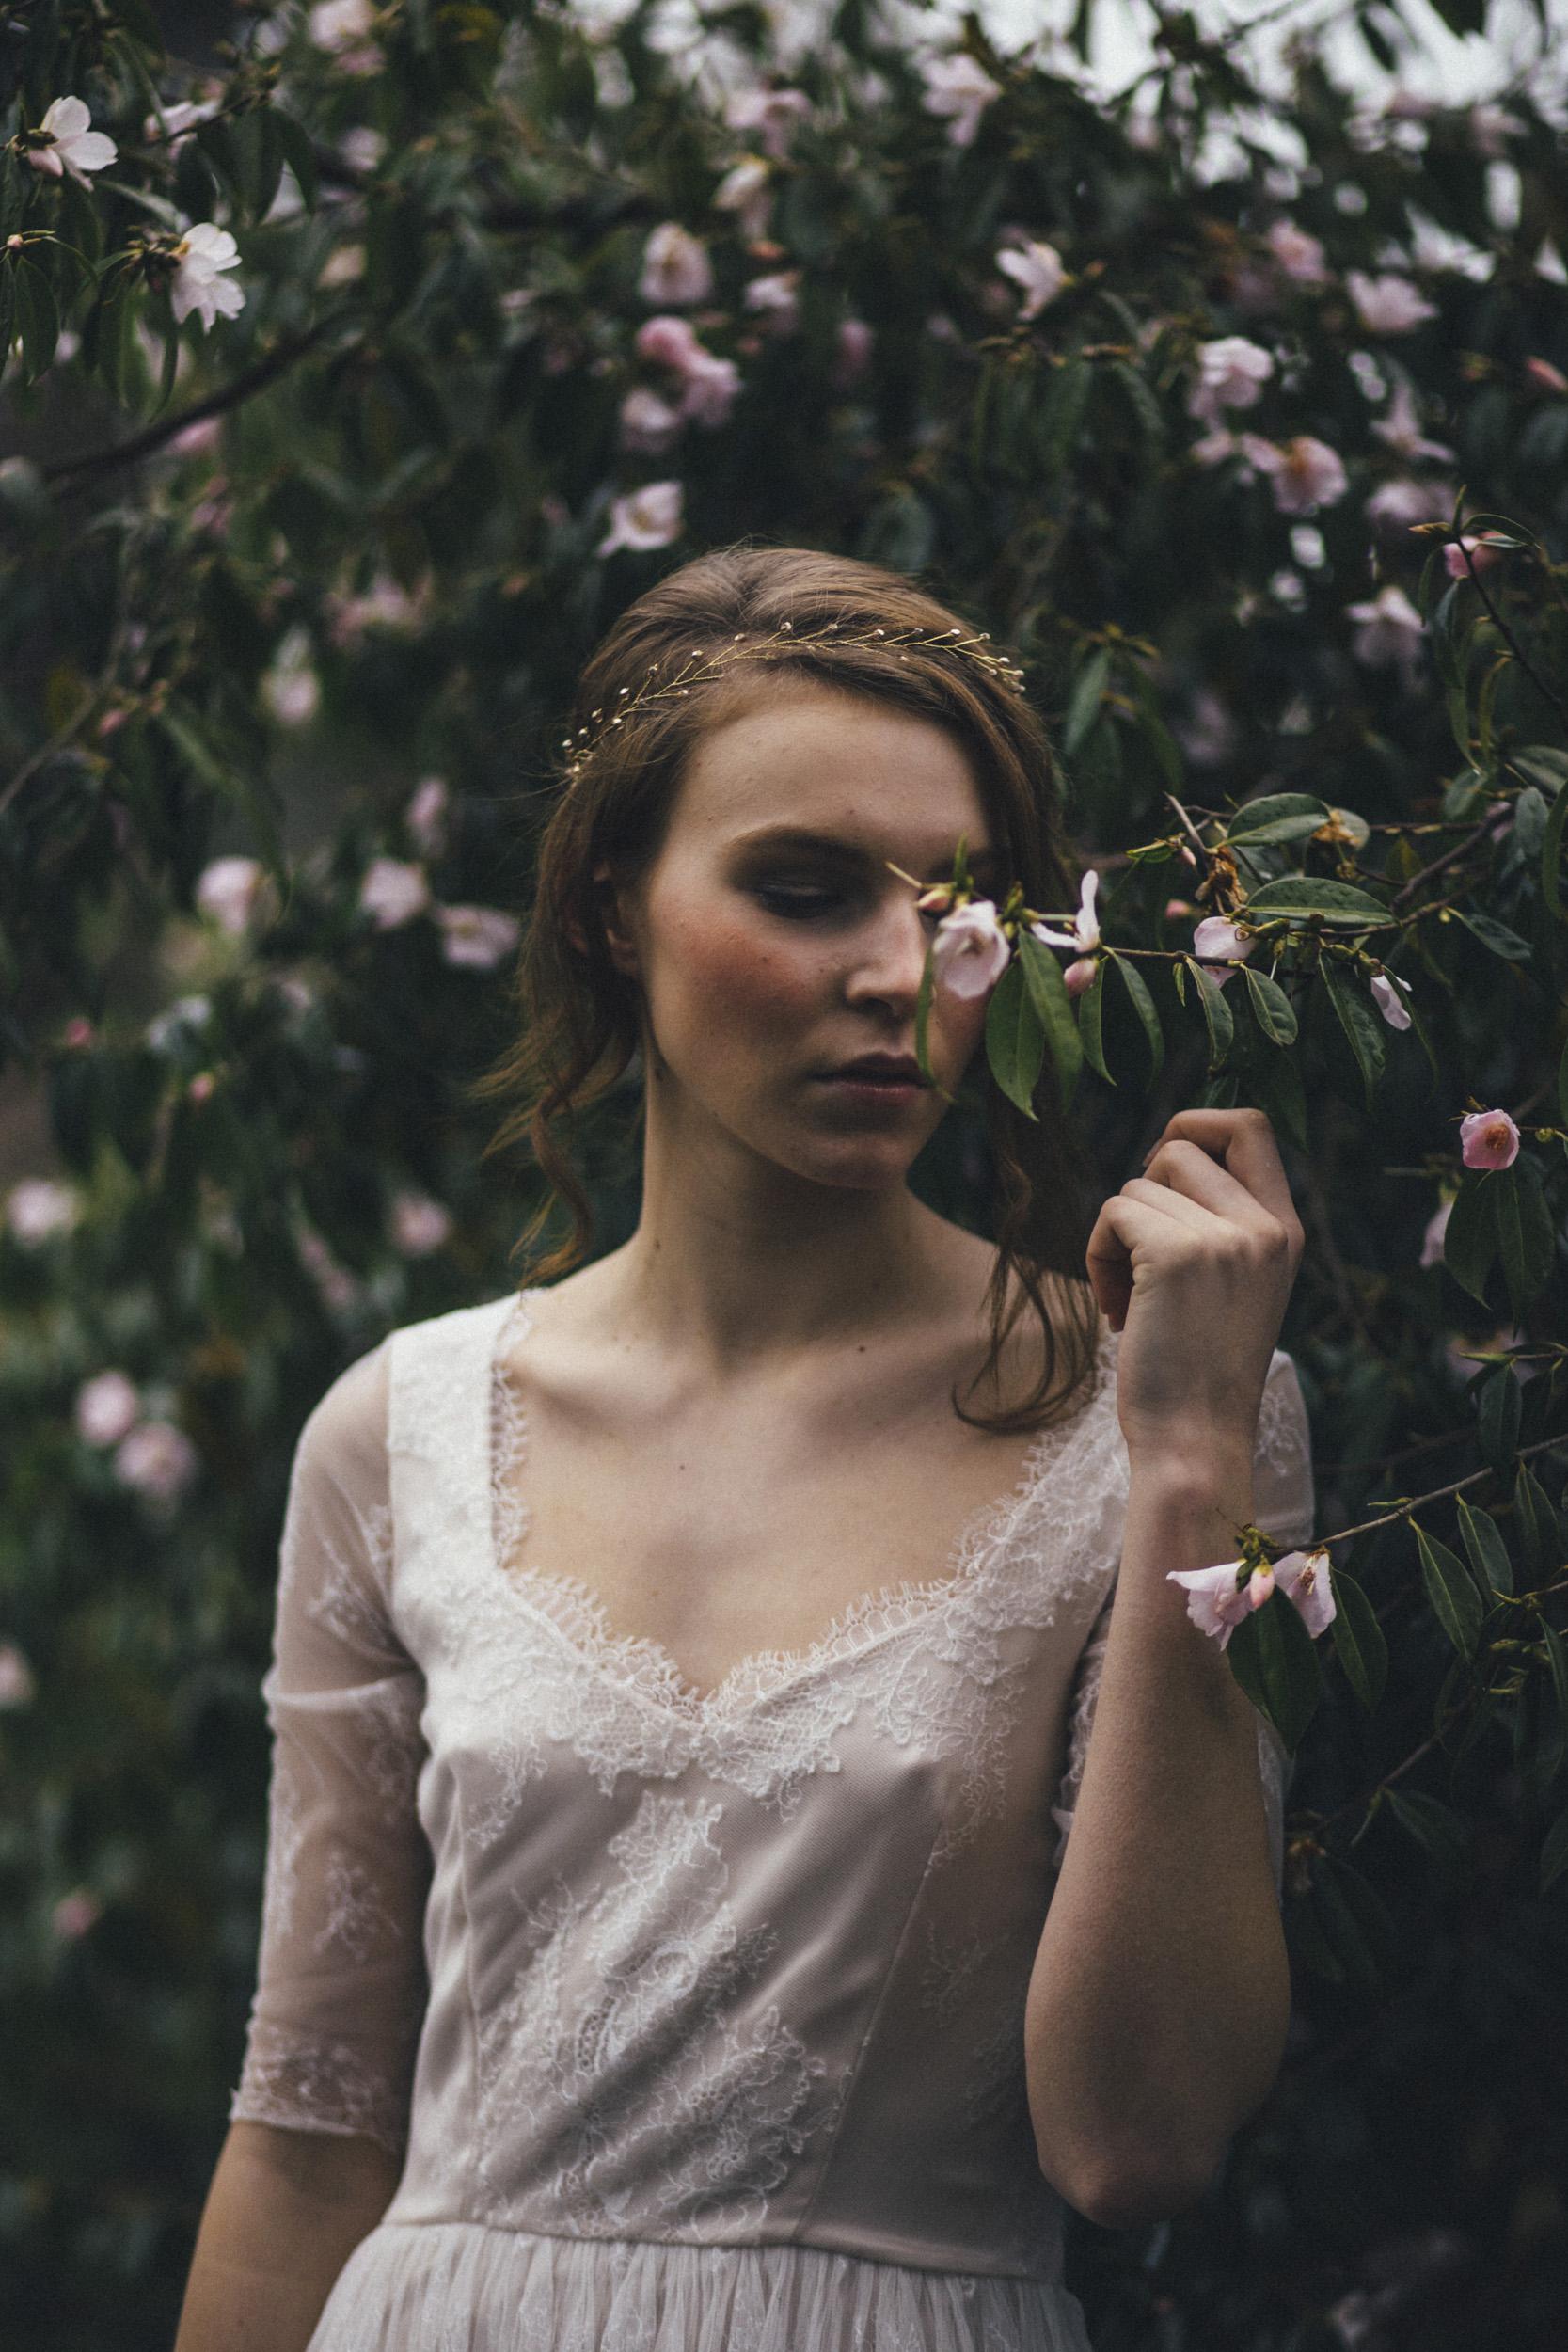 Spring-Bridal-Kate-Beaumont-Shelley-Richmond-Vintage-Wedding-Dress-5.jpg